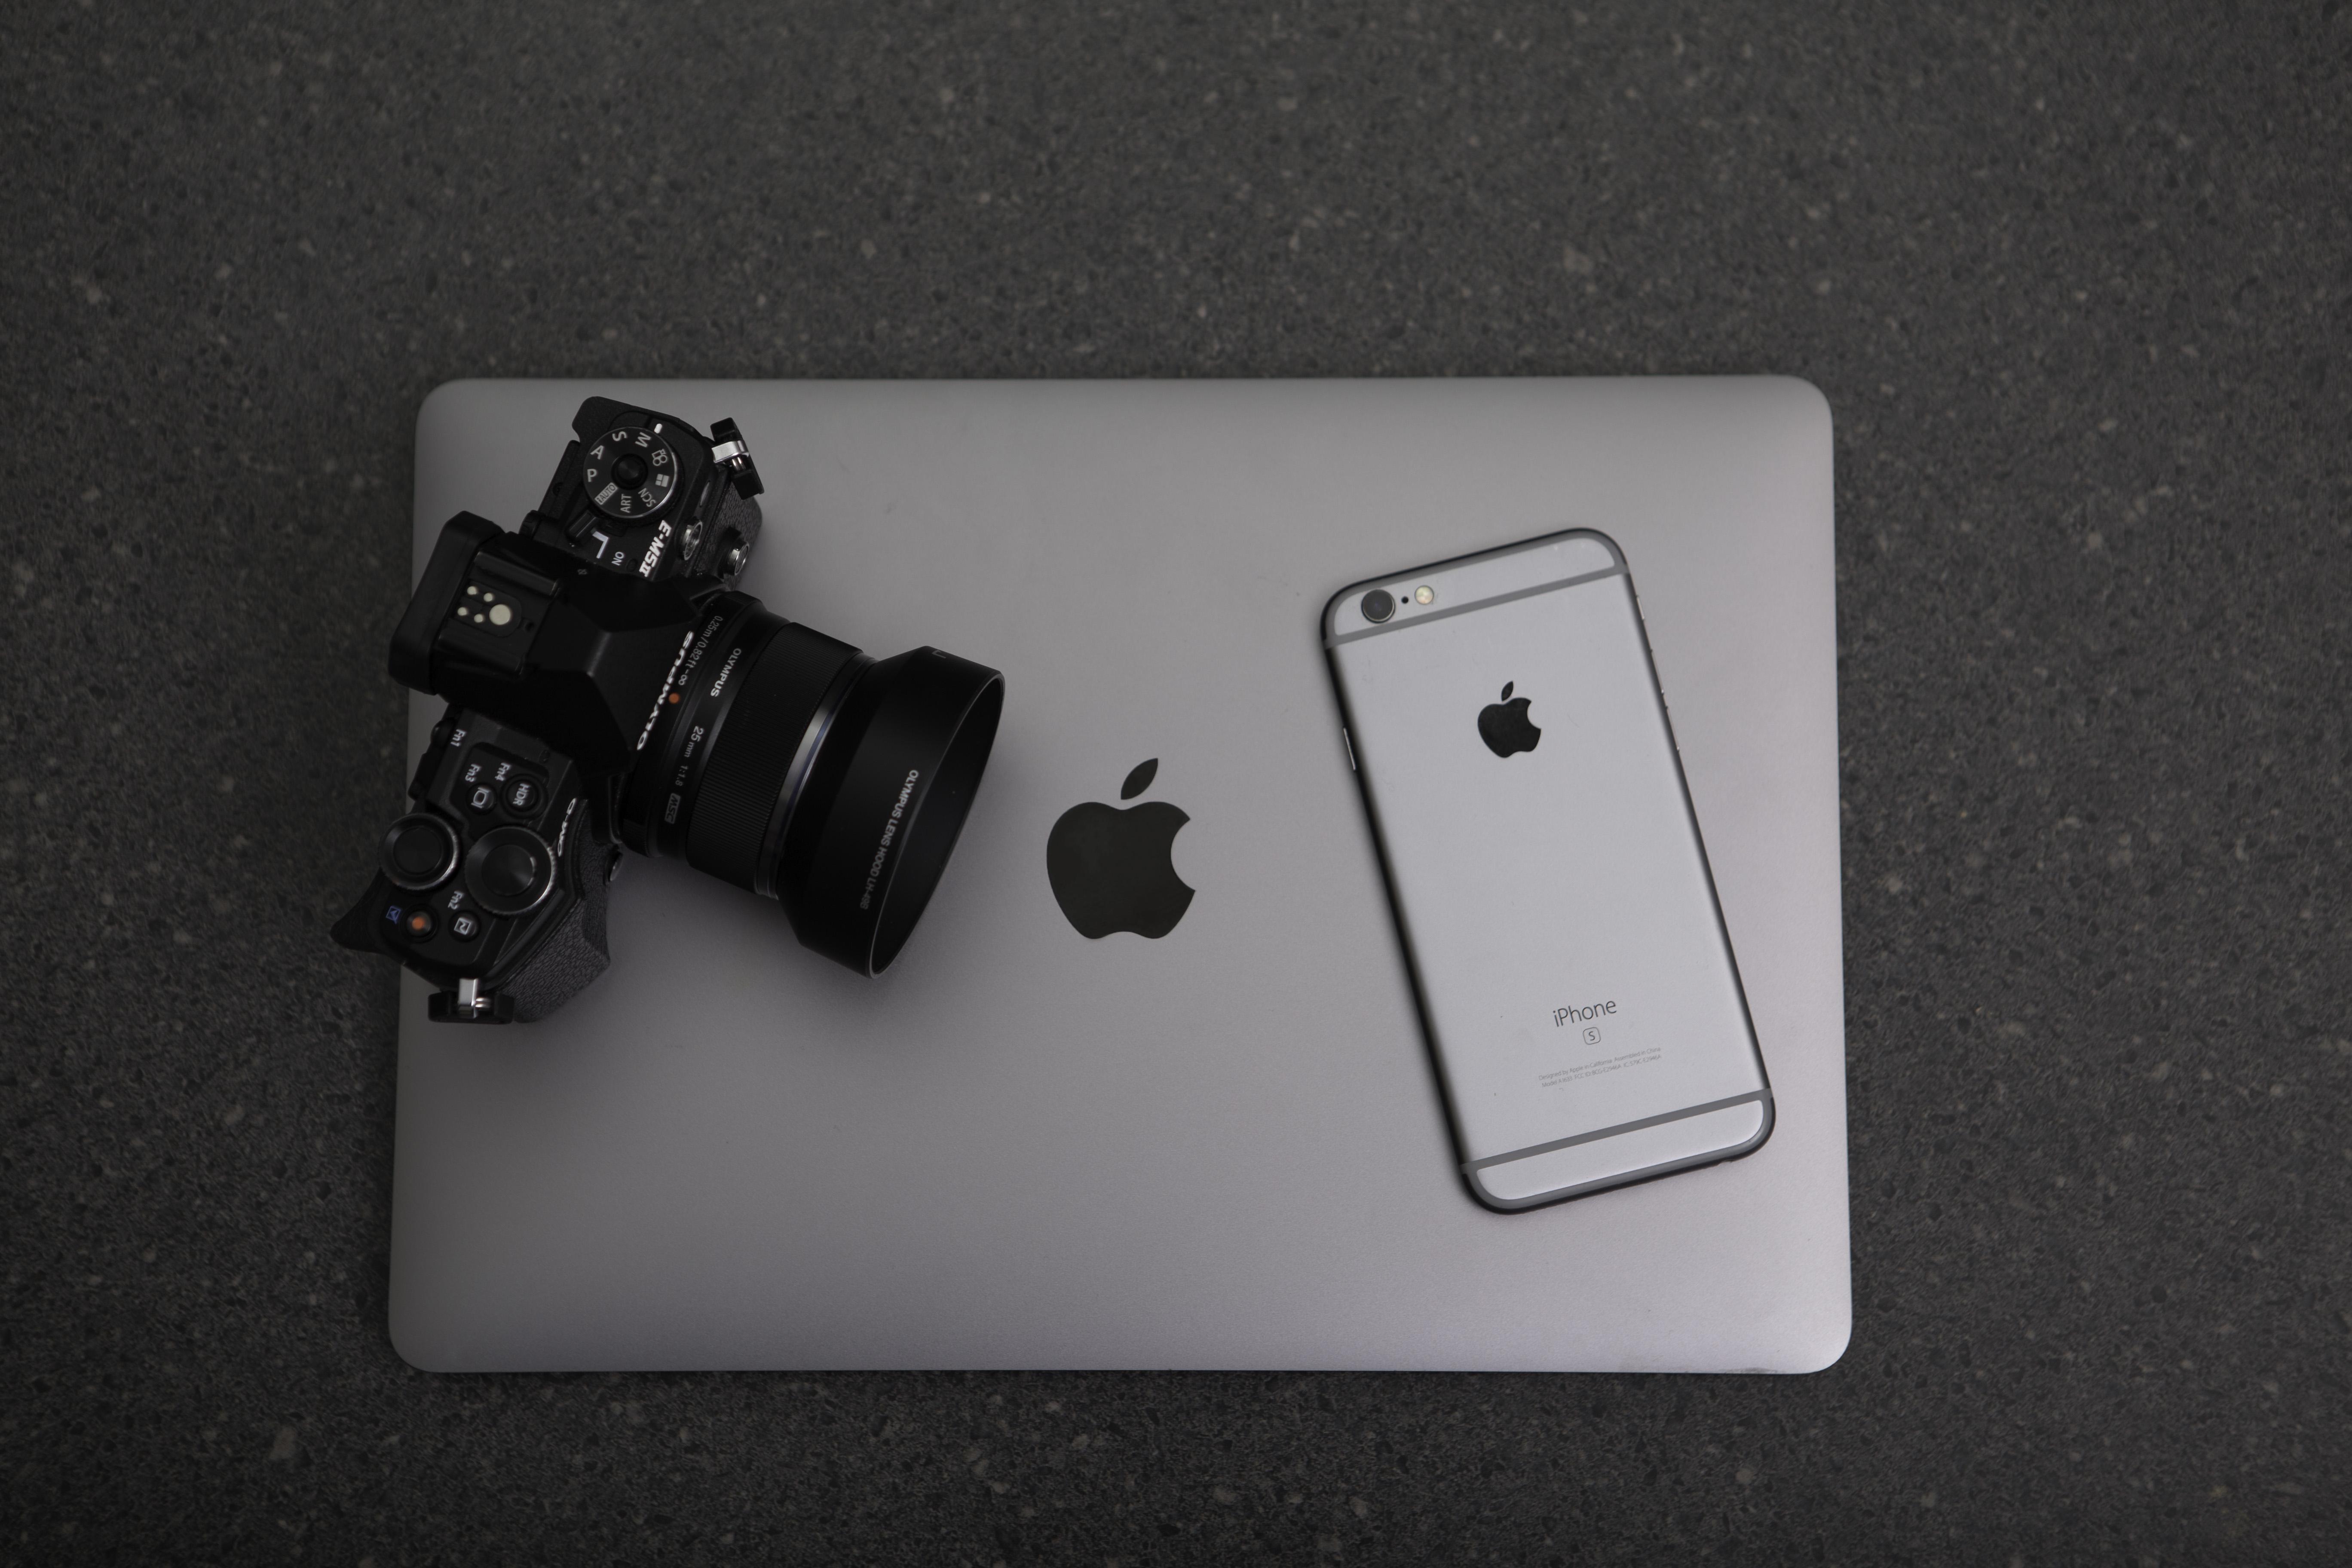 pexels-photo-306763.jpeg